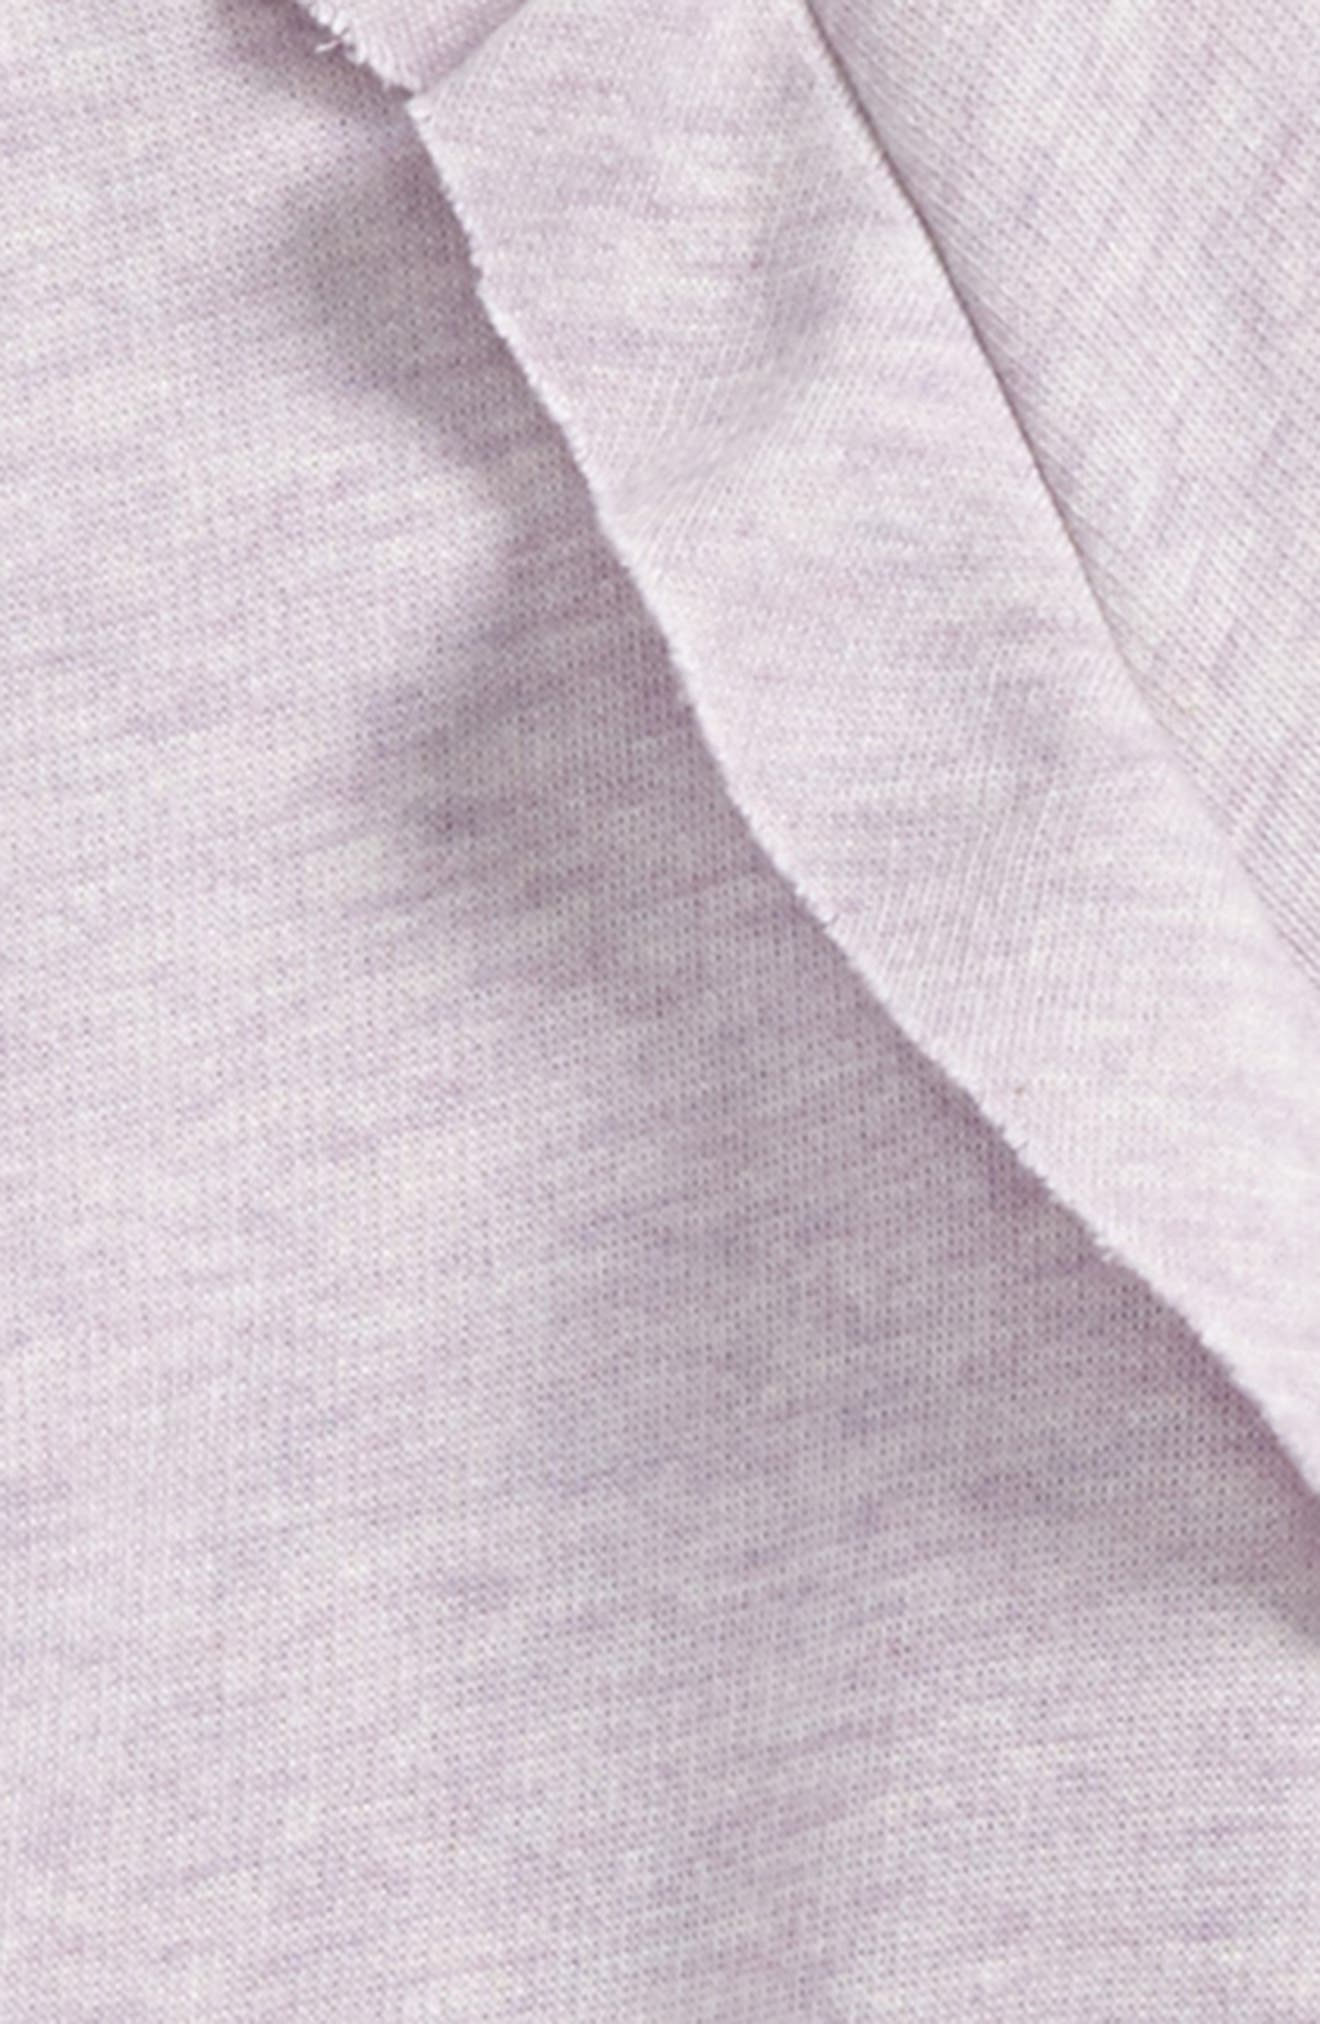 Ruffle Fleece Sweatshirt,                             Alternate thumbnail 2, color,                             PURPLE PETAL HEATHER